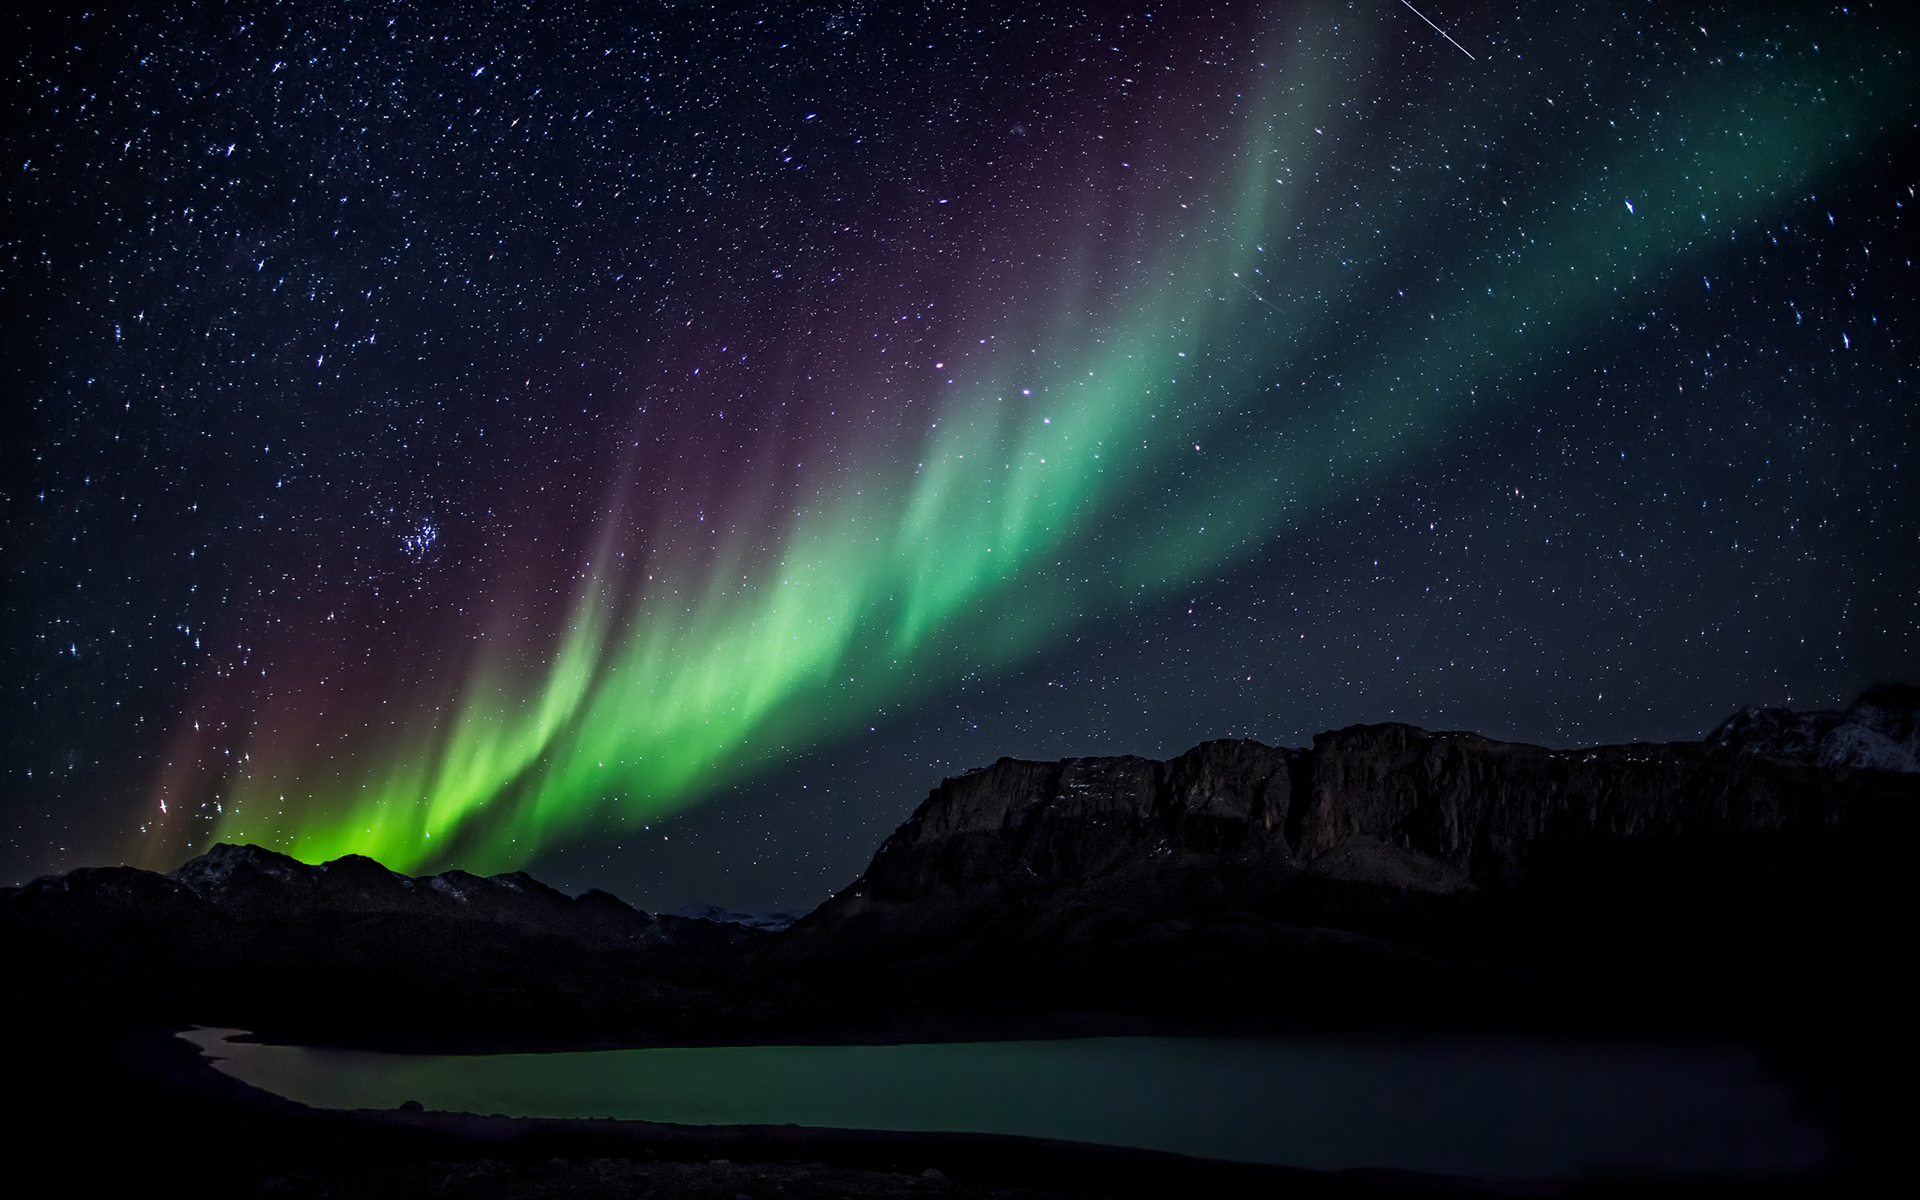 Aurora Borealis iPhone Wallpaper - wallpaper.